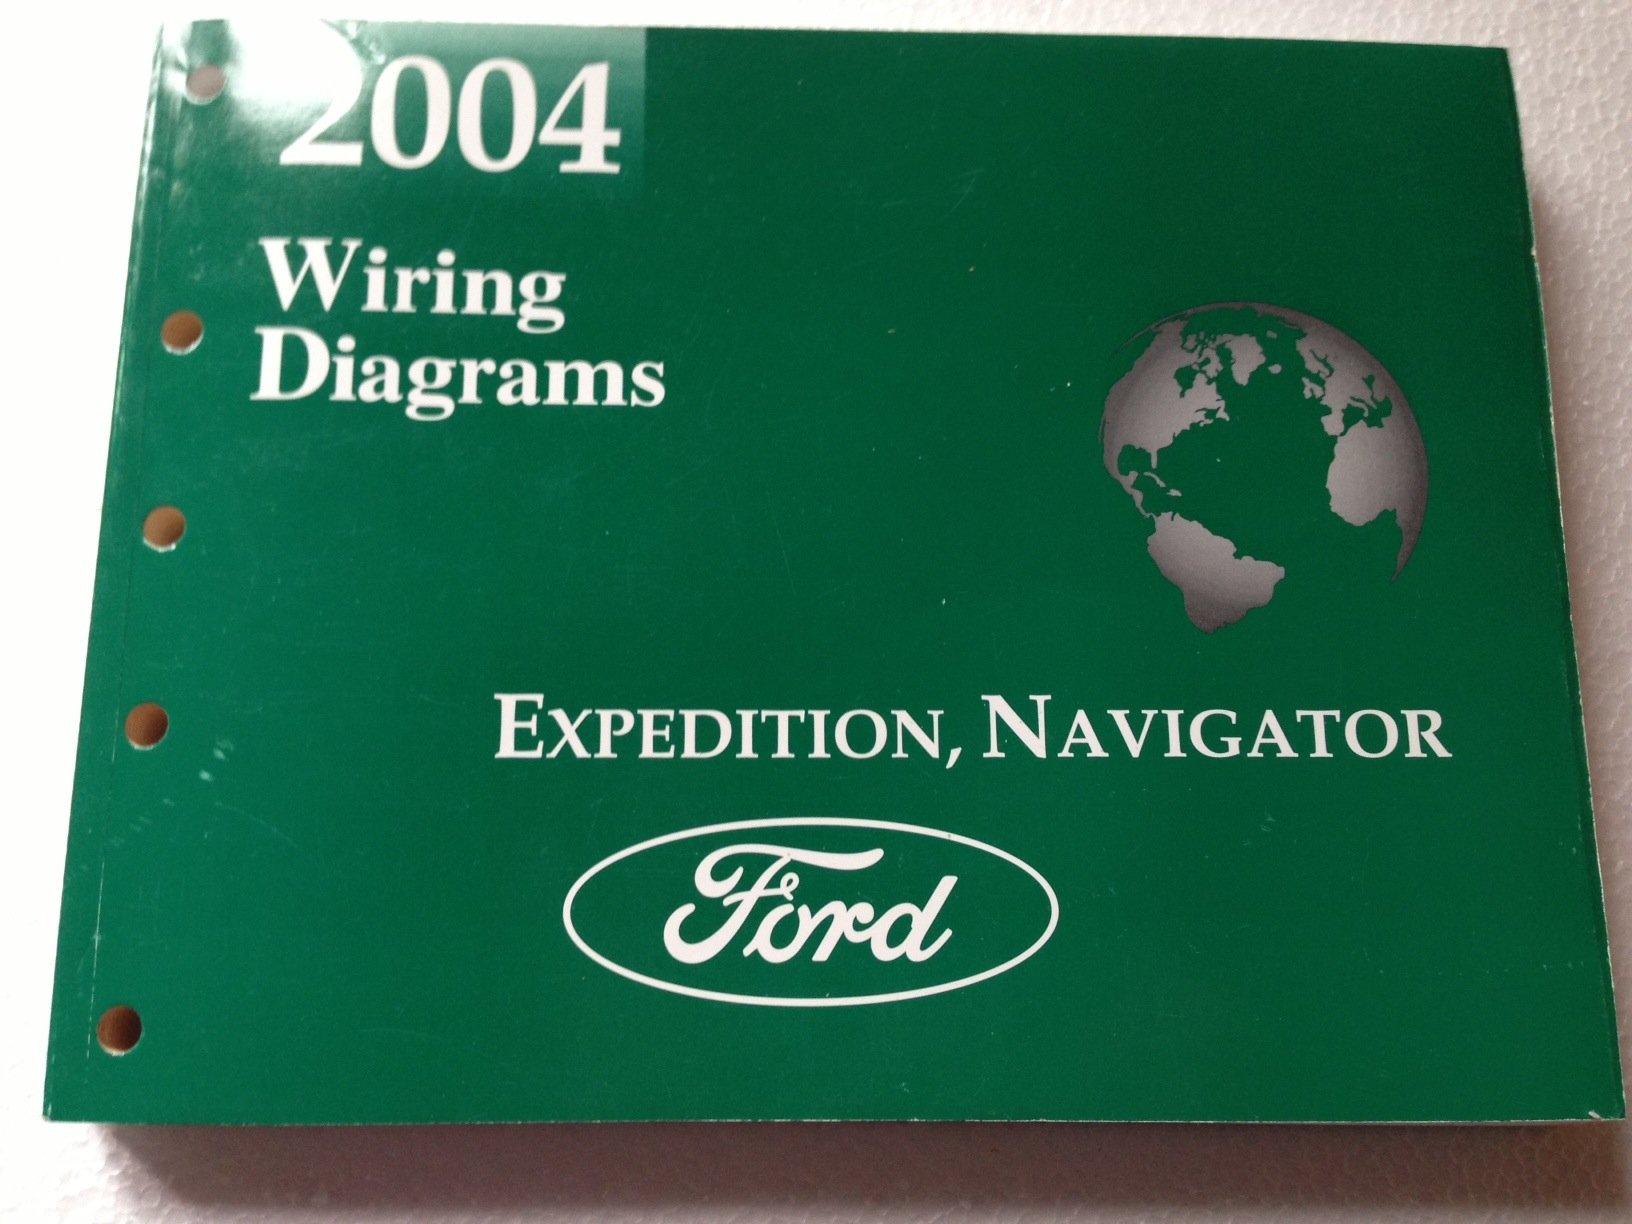 2004 ford expedition lincoln navigator wiring diagram manual original  paperback – 2004